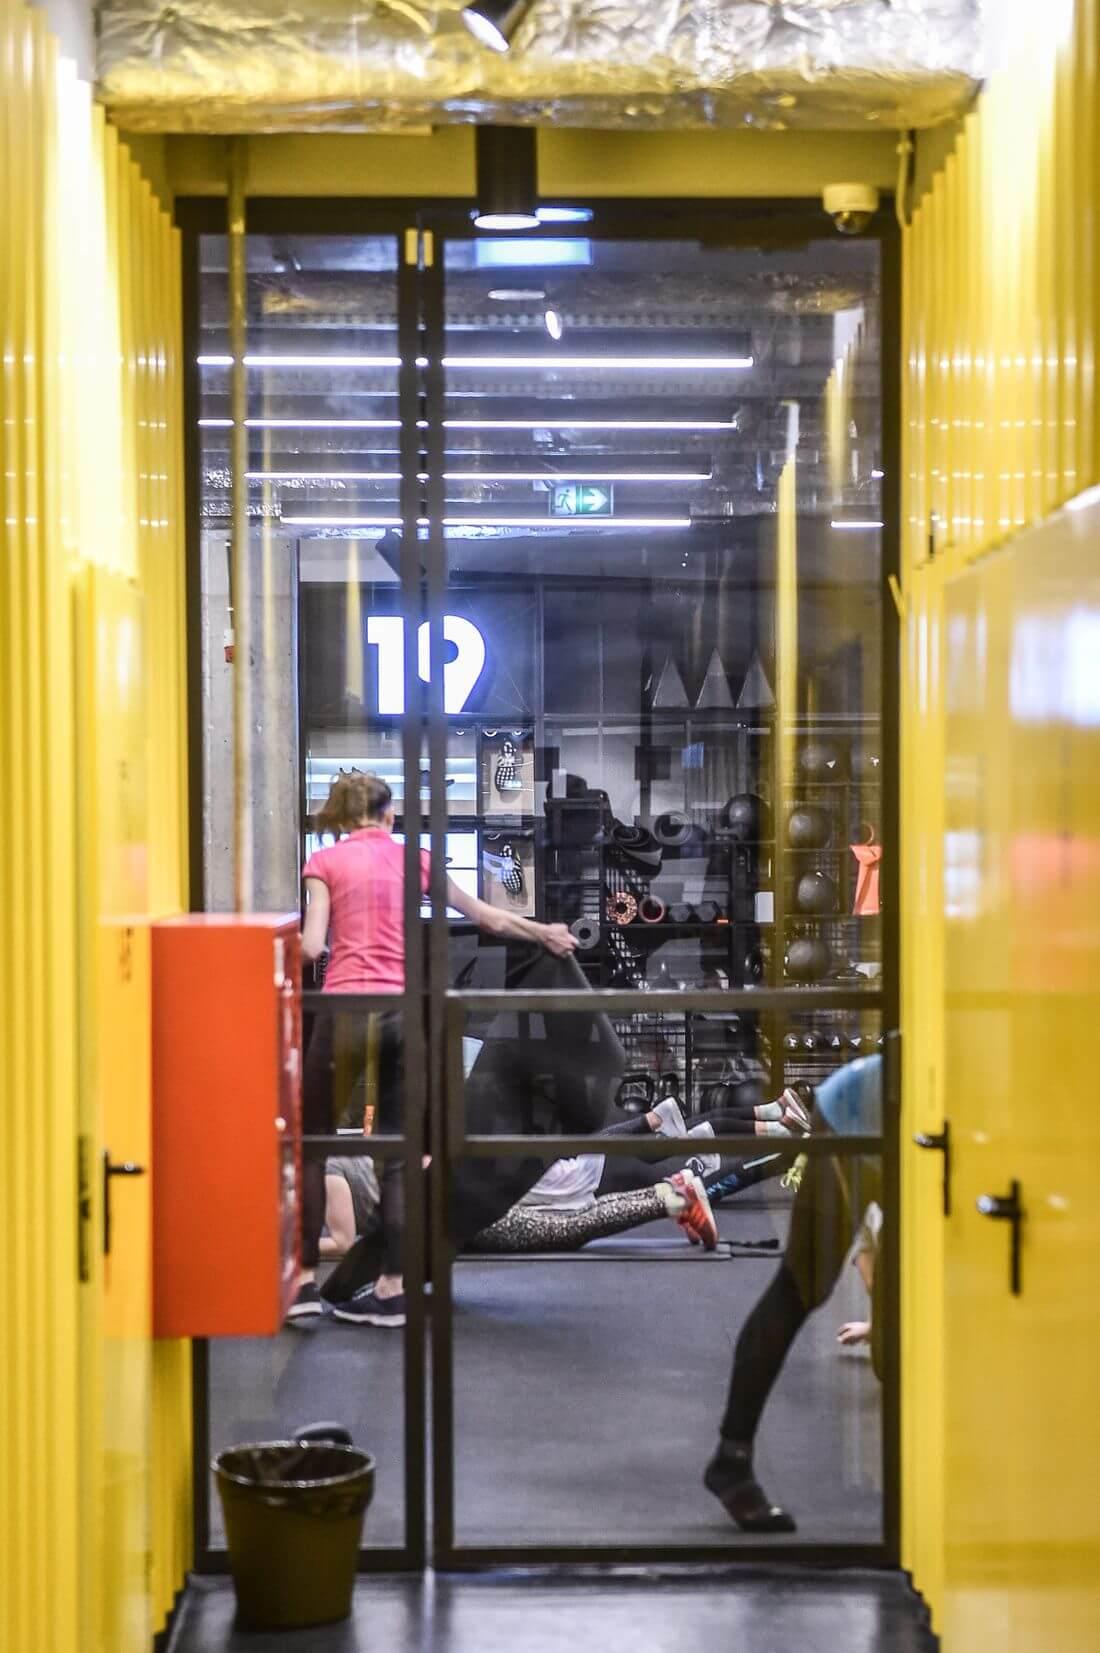 Loft doors Black Metal Closed in yellow corridor in Adidas Runners Warsaw